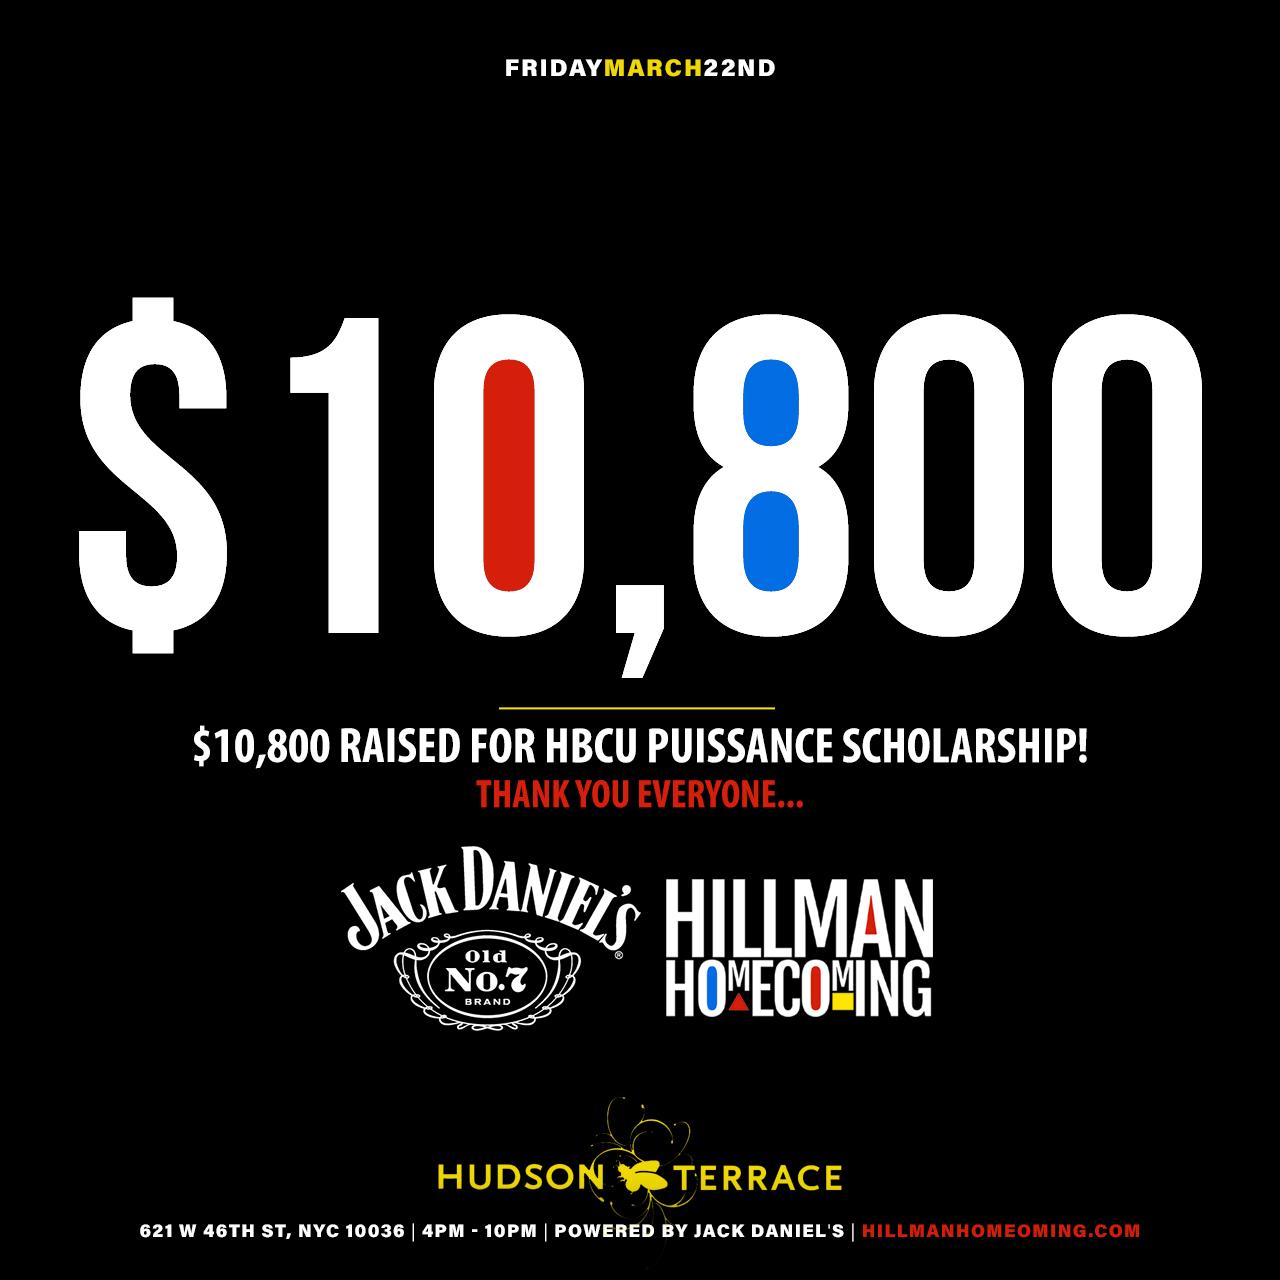 TPBB-HillmanHomecoming-ThankYou-2019.jpg